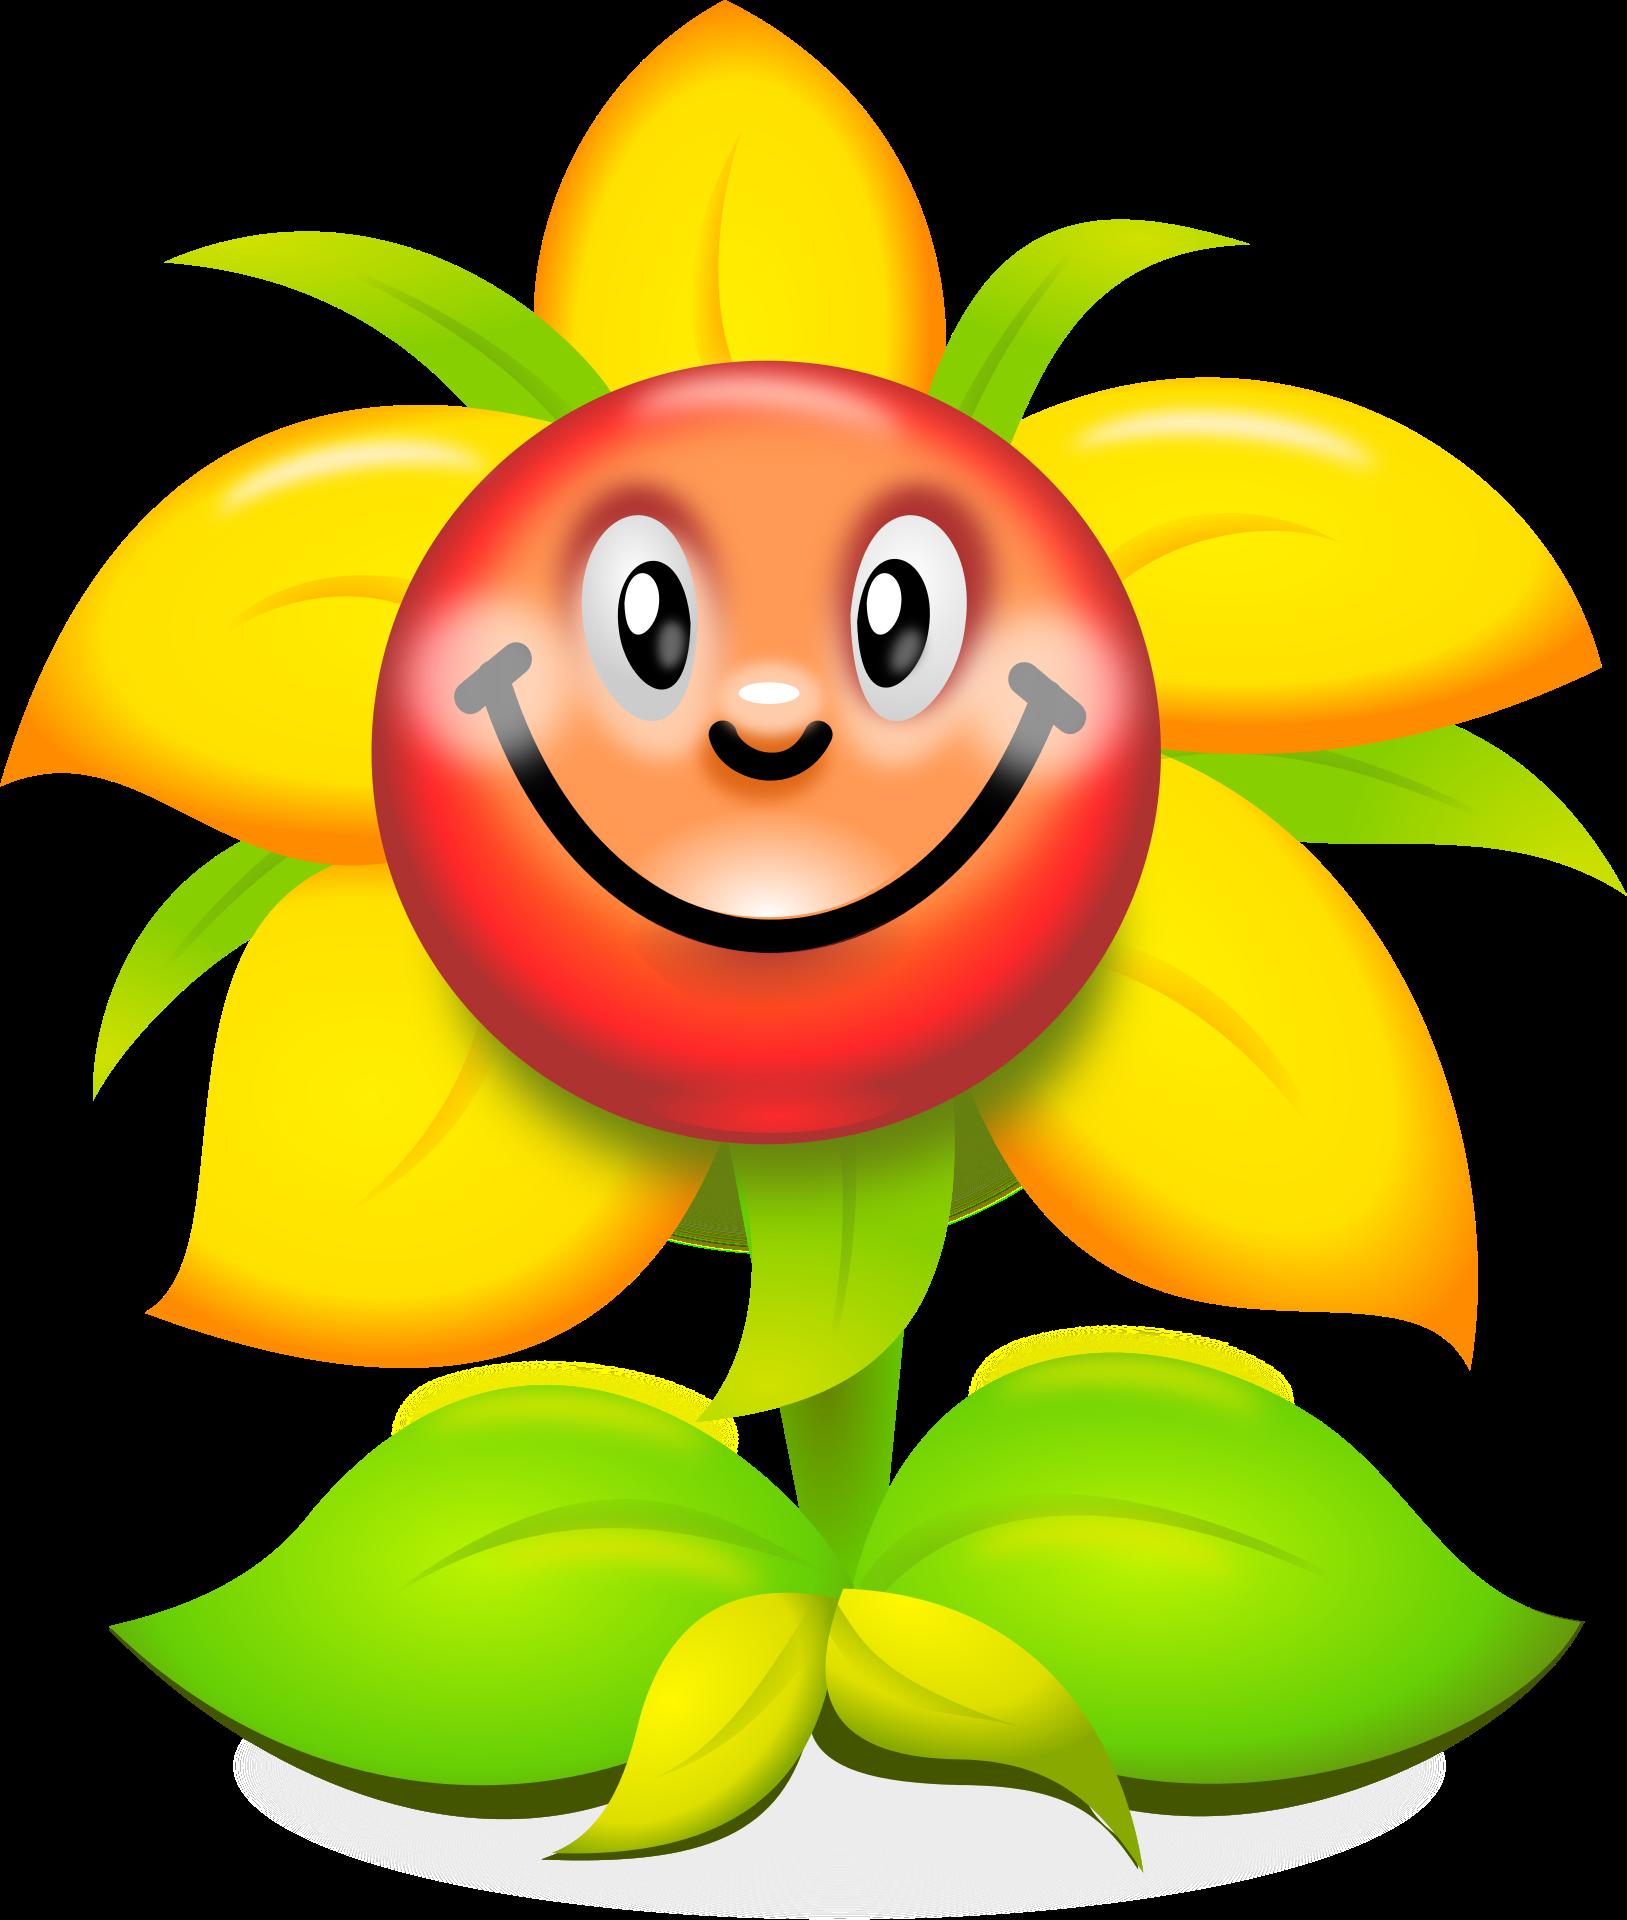 Flower humour clip art. Pomegranate clipart smiley fruit